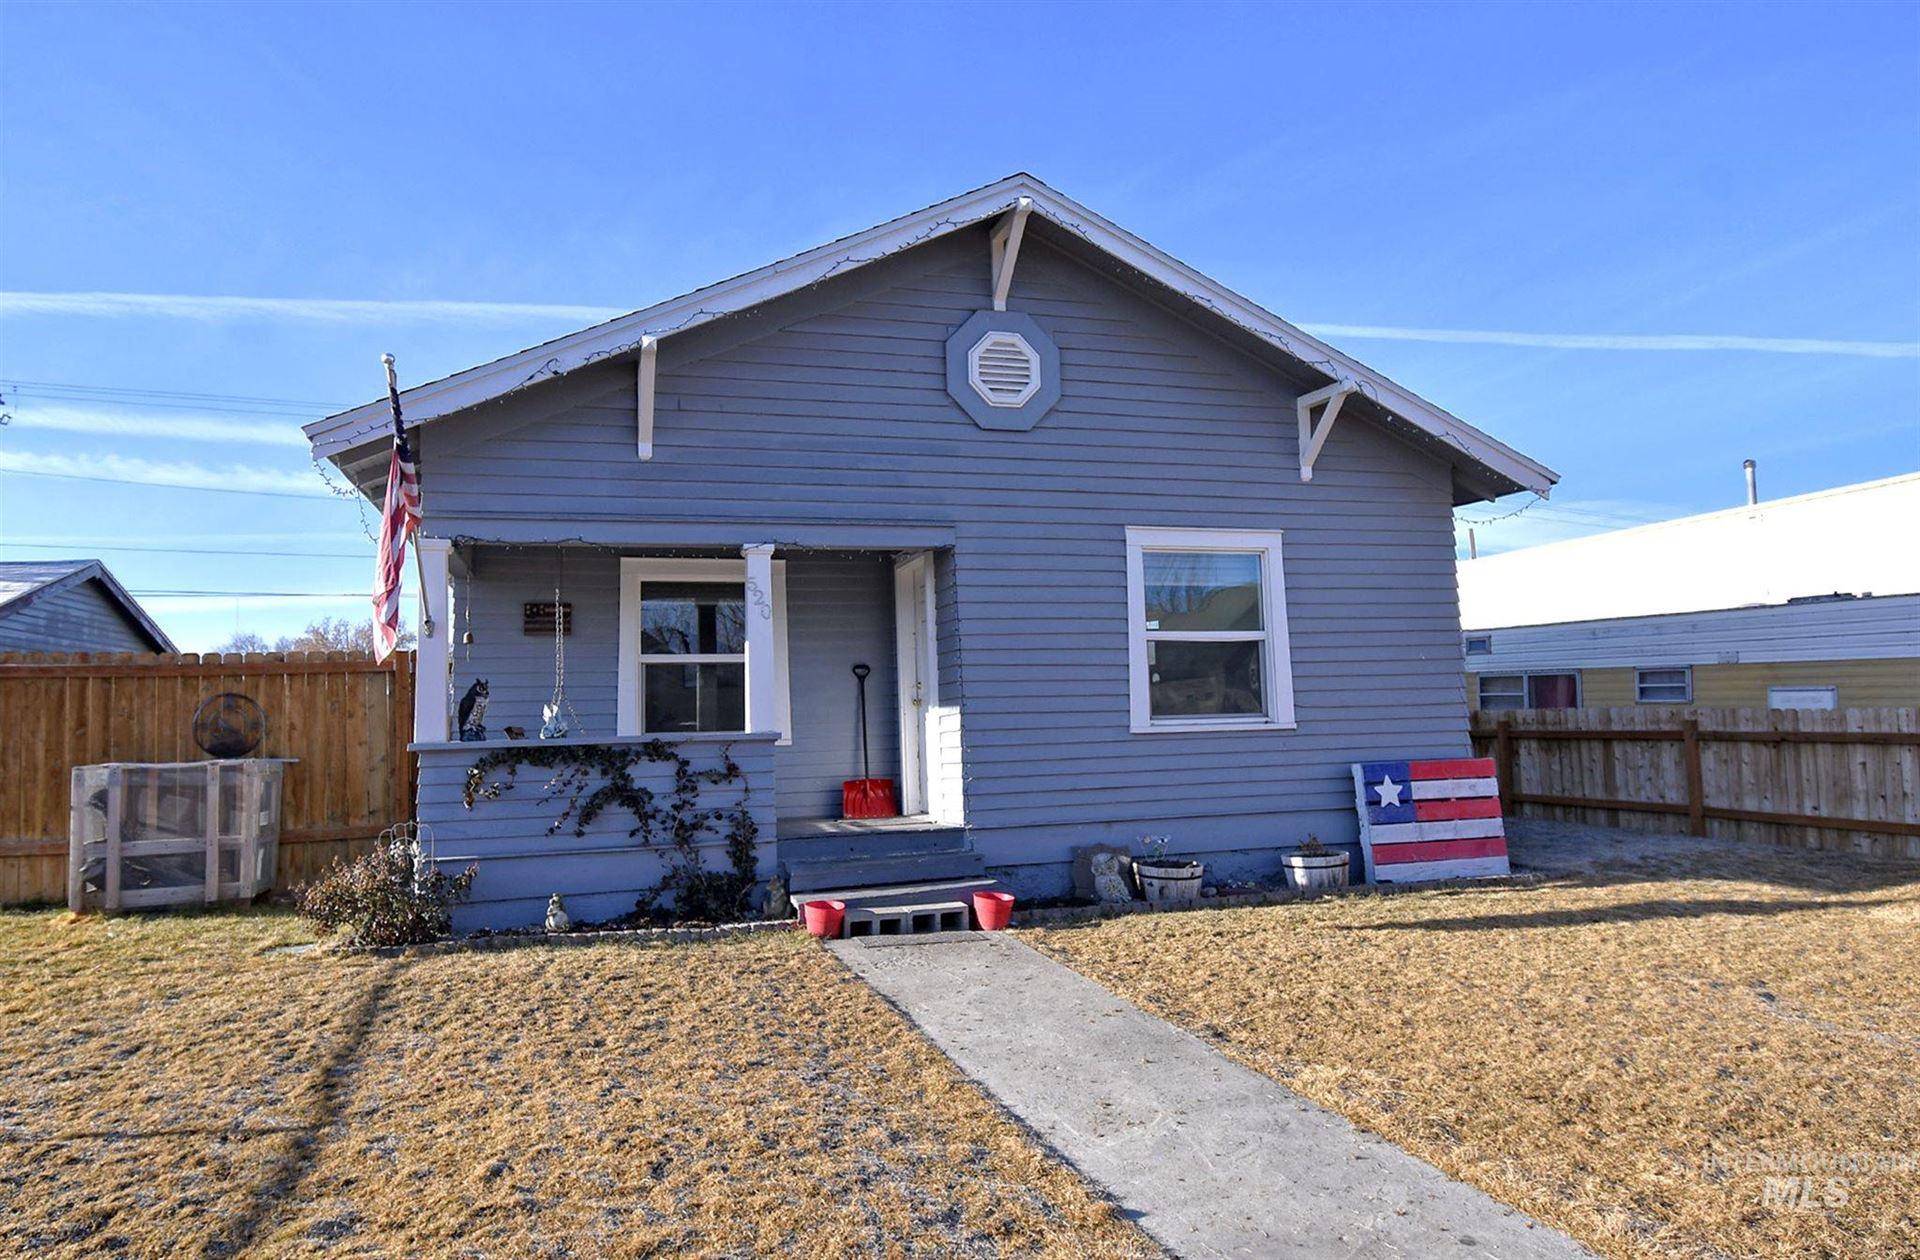 Photo of 520 2nd Ave E, Twin Falls, ID 83301 (MLS # 98791371)